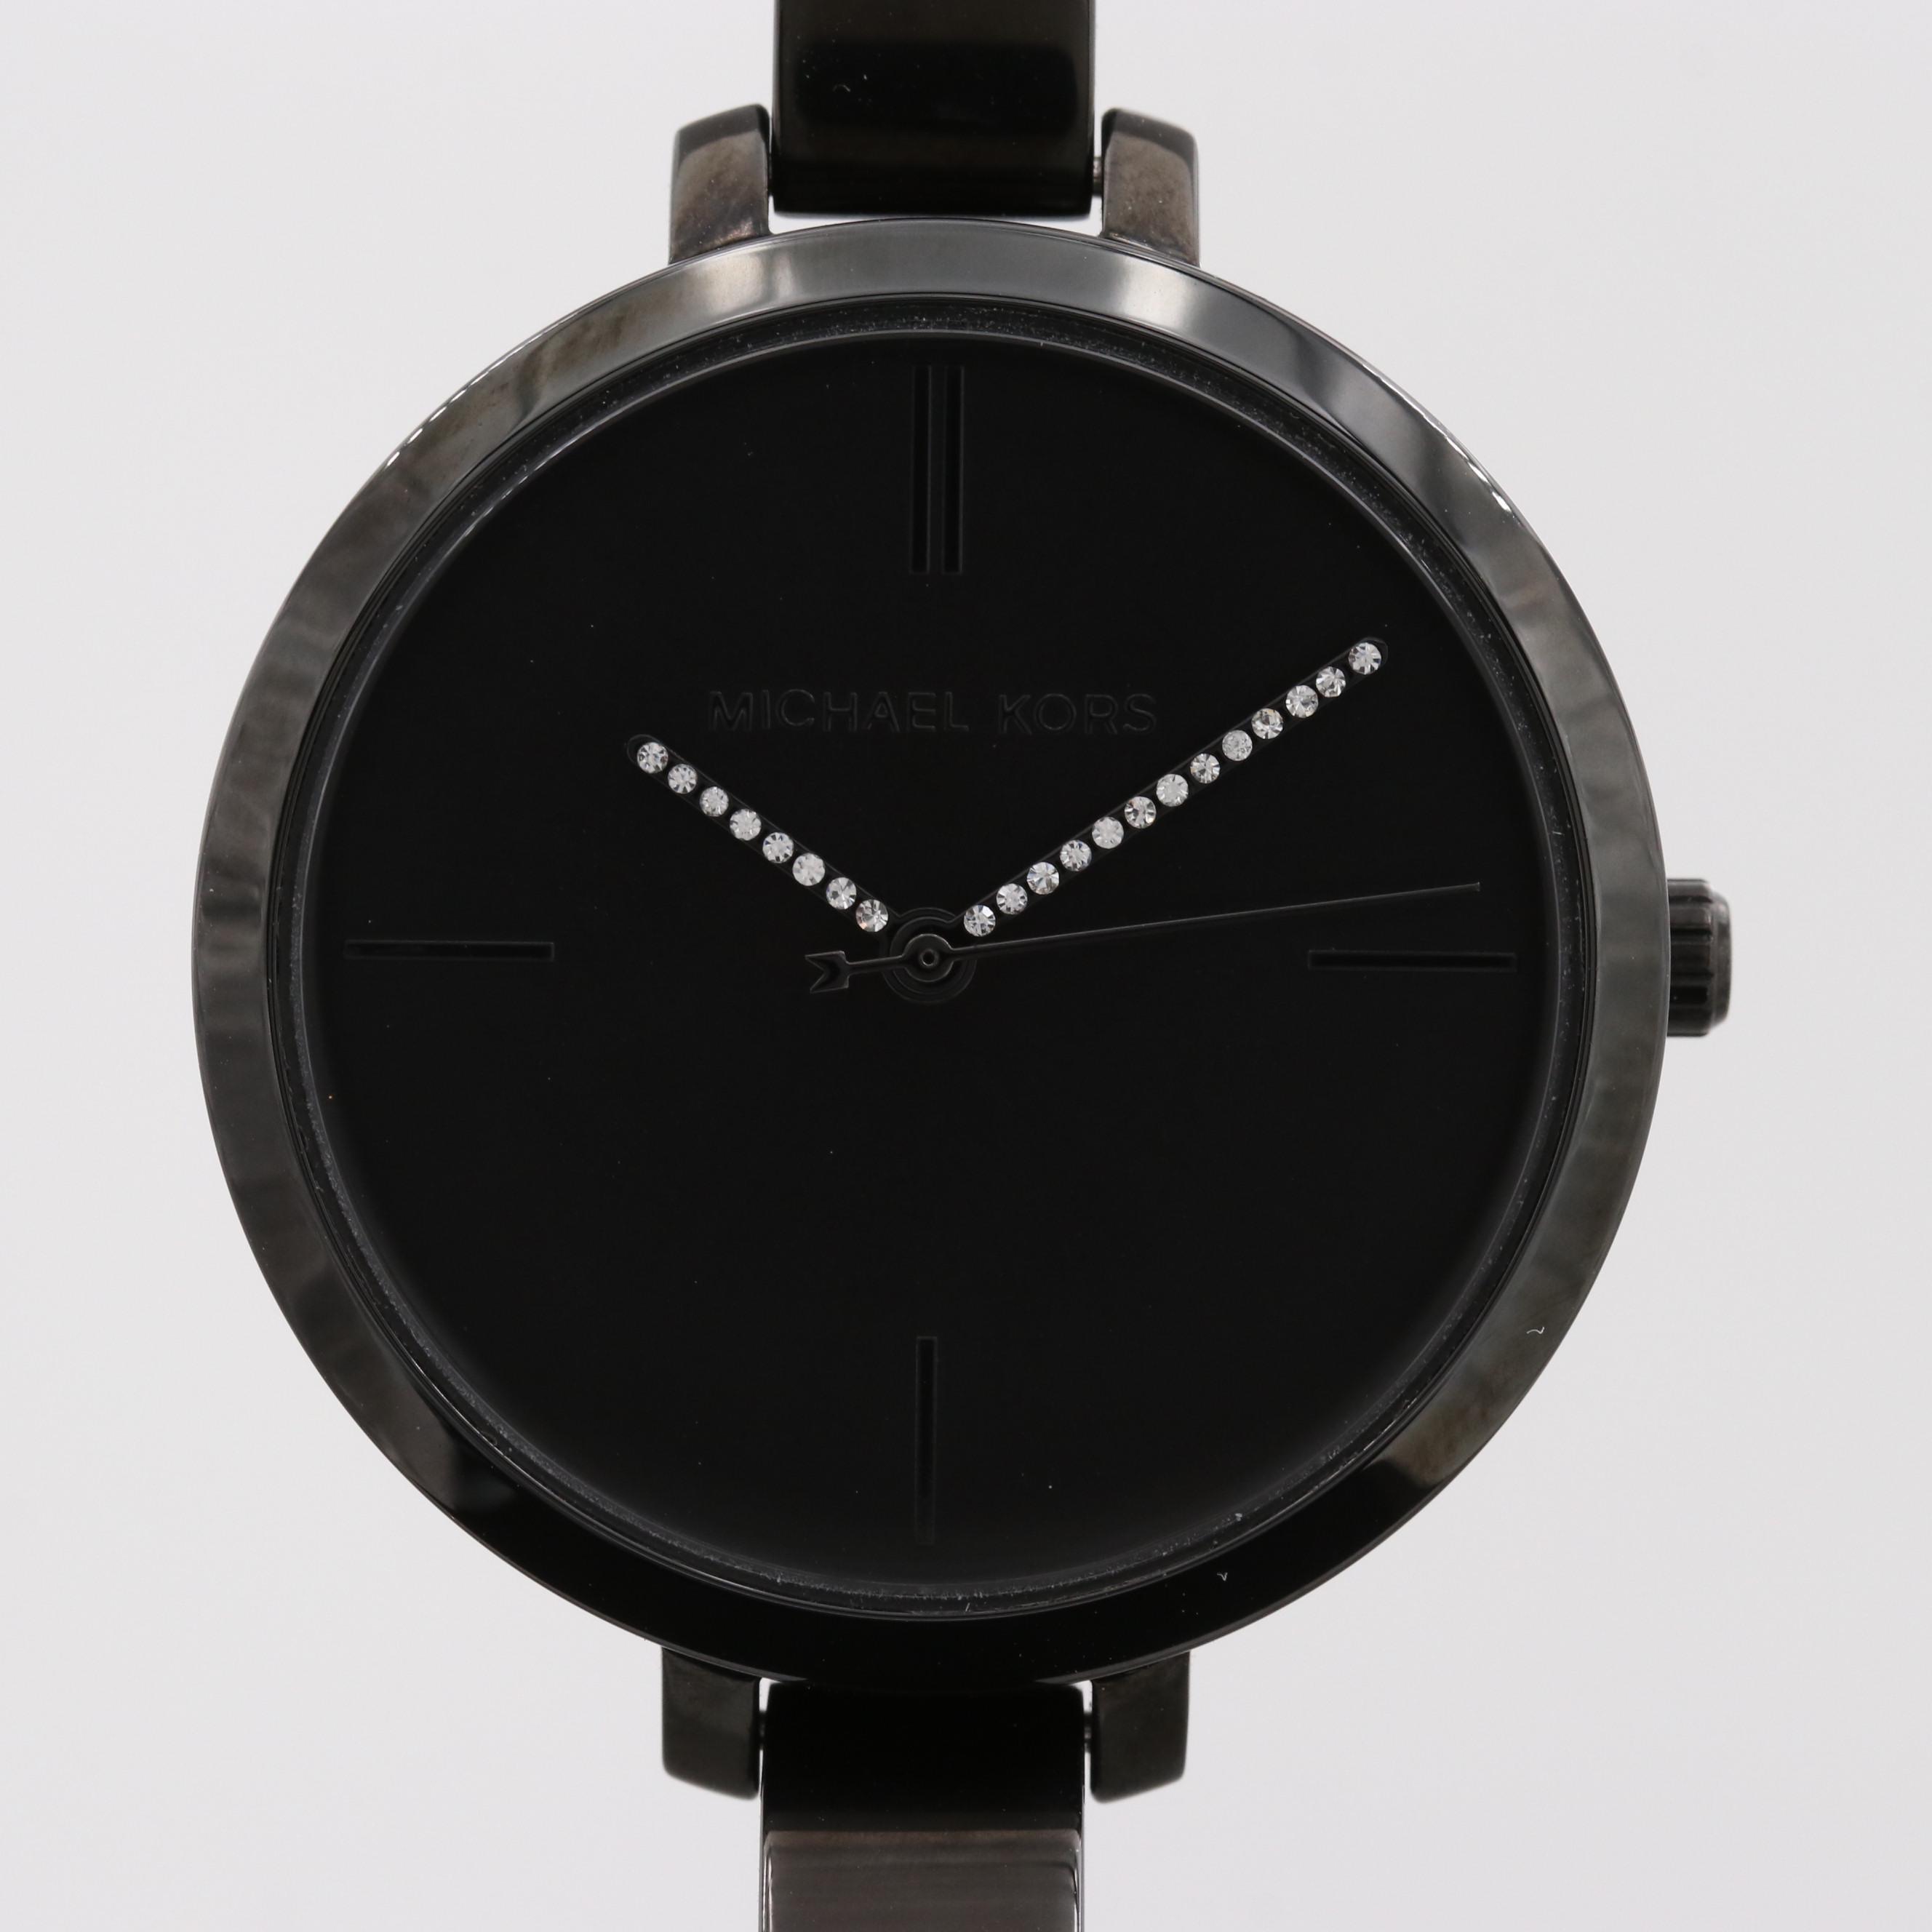 Michael Kors Black PVD Quartz Wristwatch